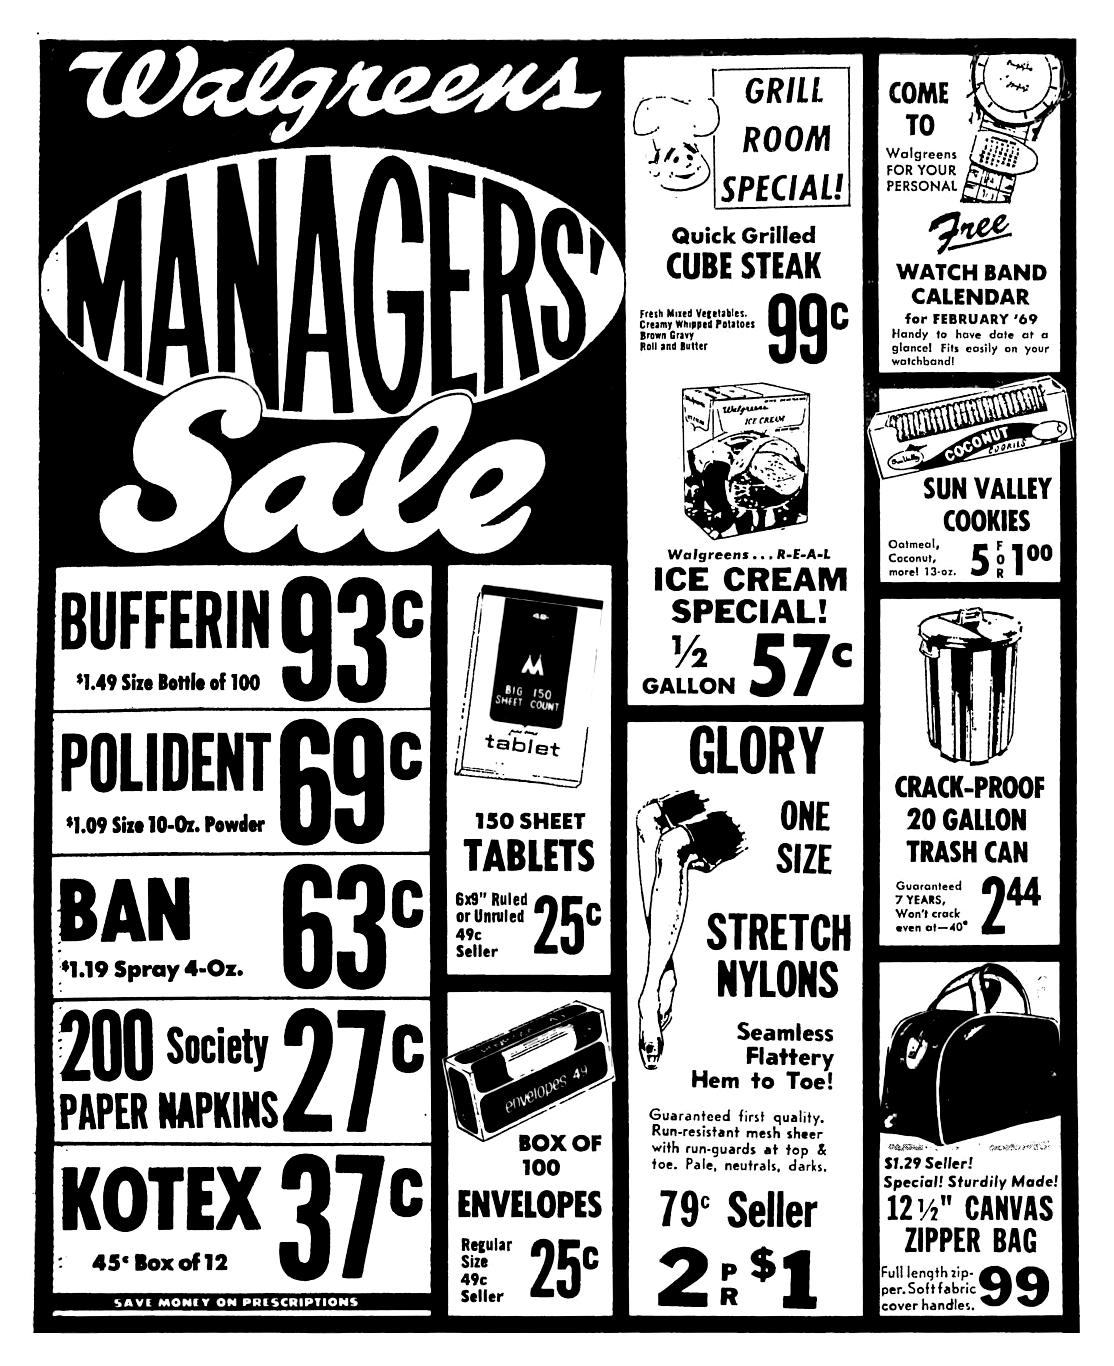 Walgreens Managers Sale - January 1969 | 1960\'s Newspaper Vintage ...